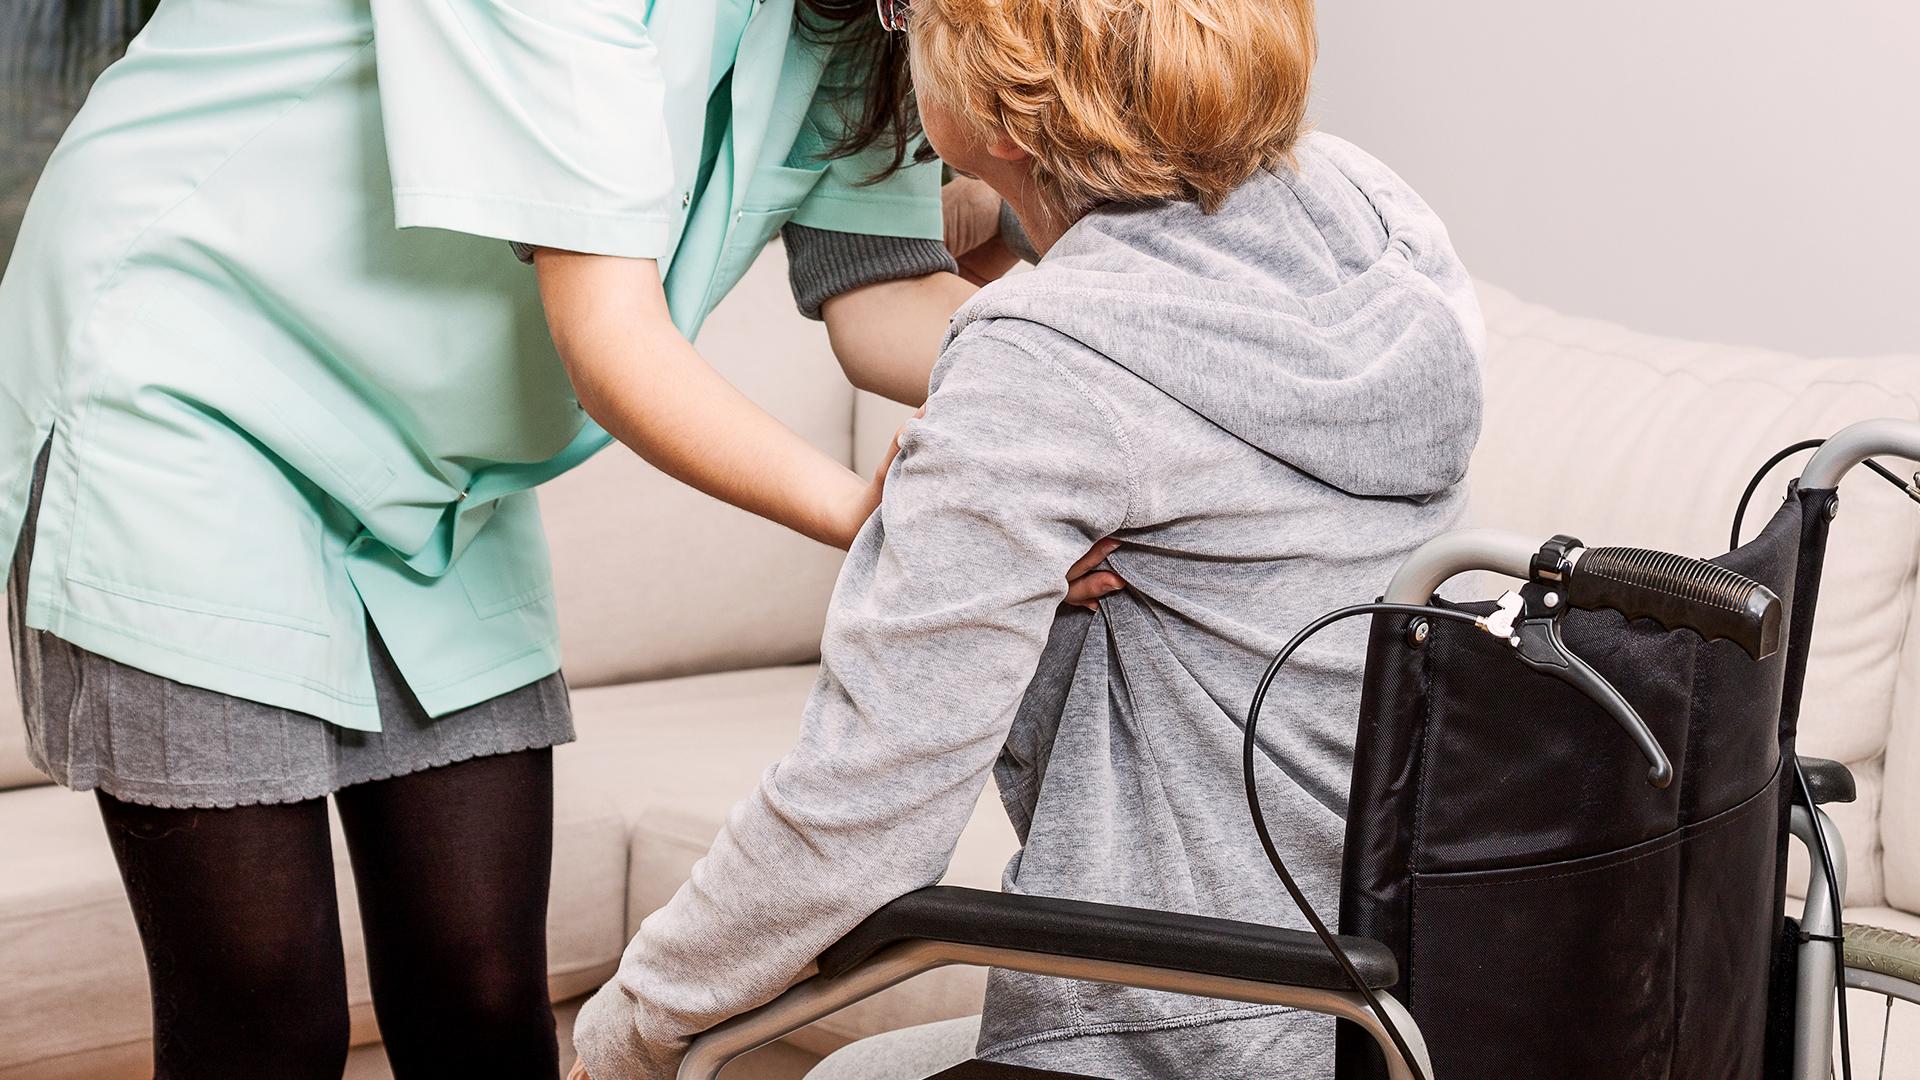 priority_designs_wearable_tech_healthcare_nurse_lift